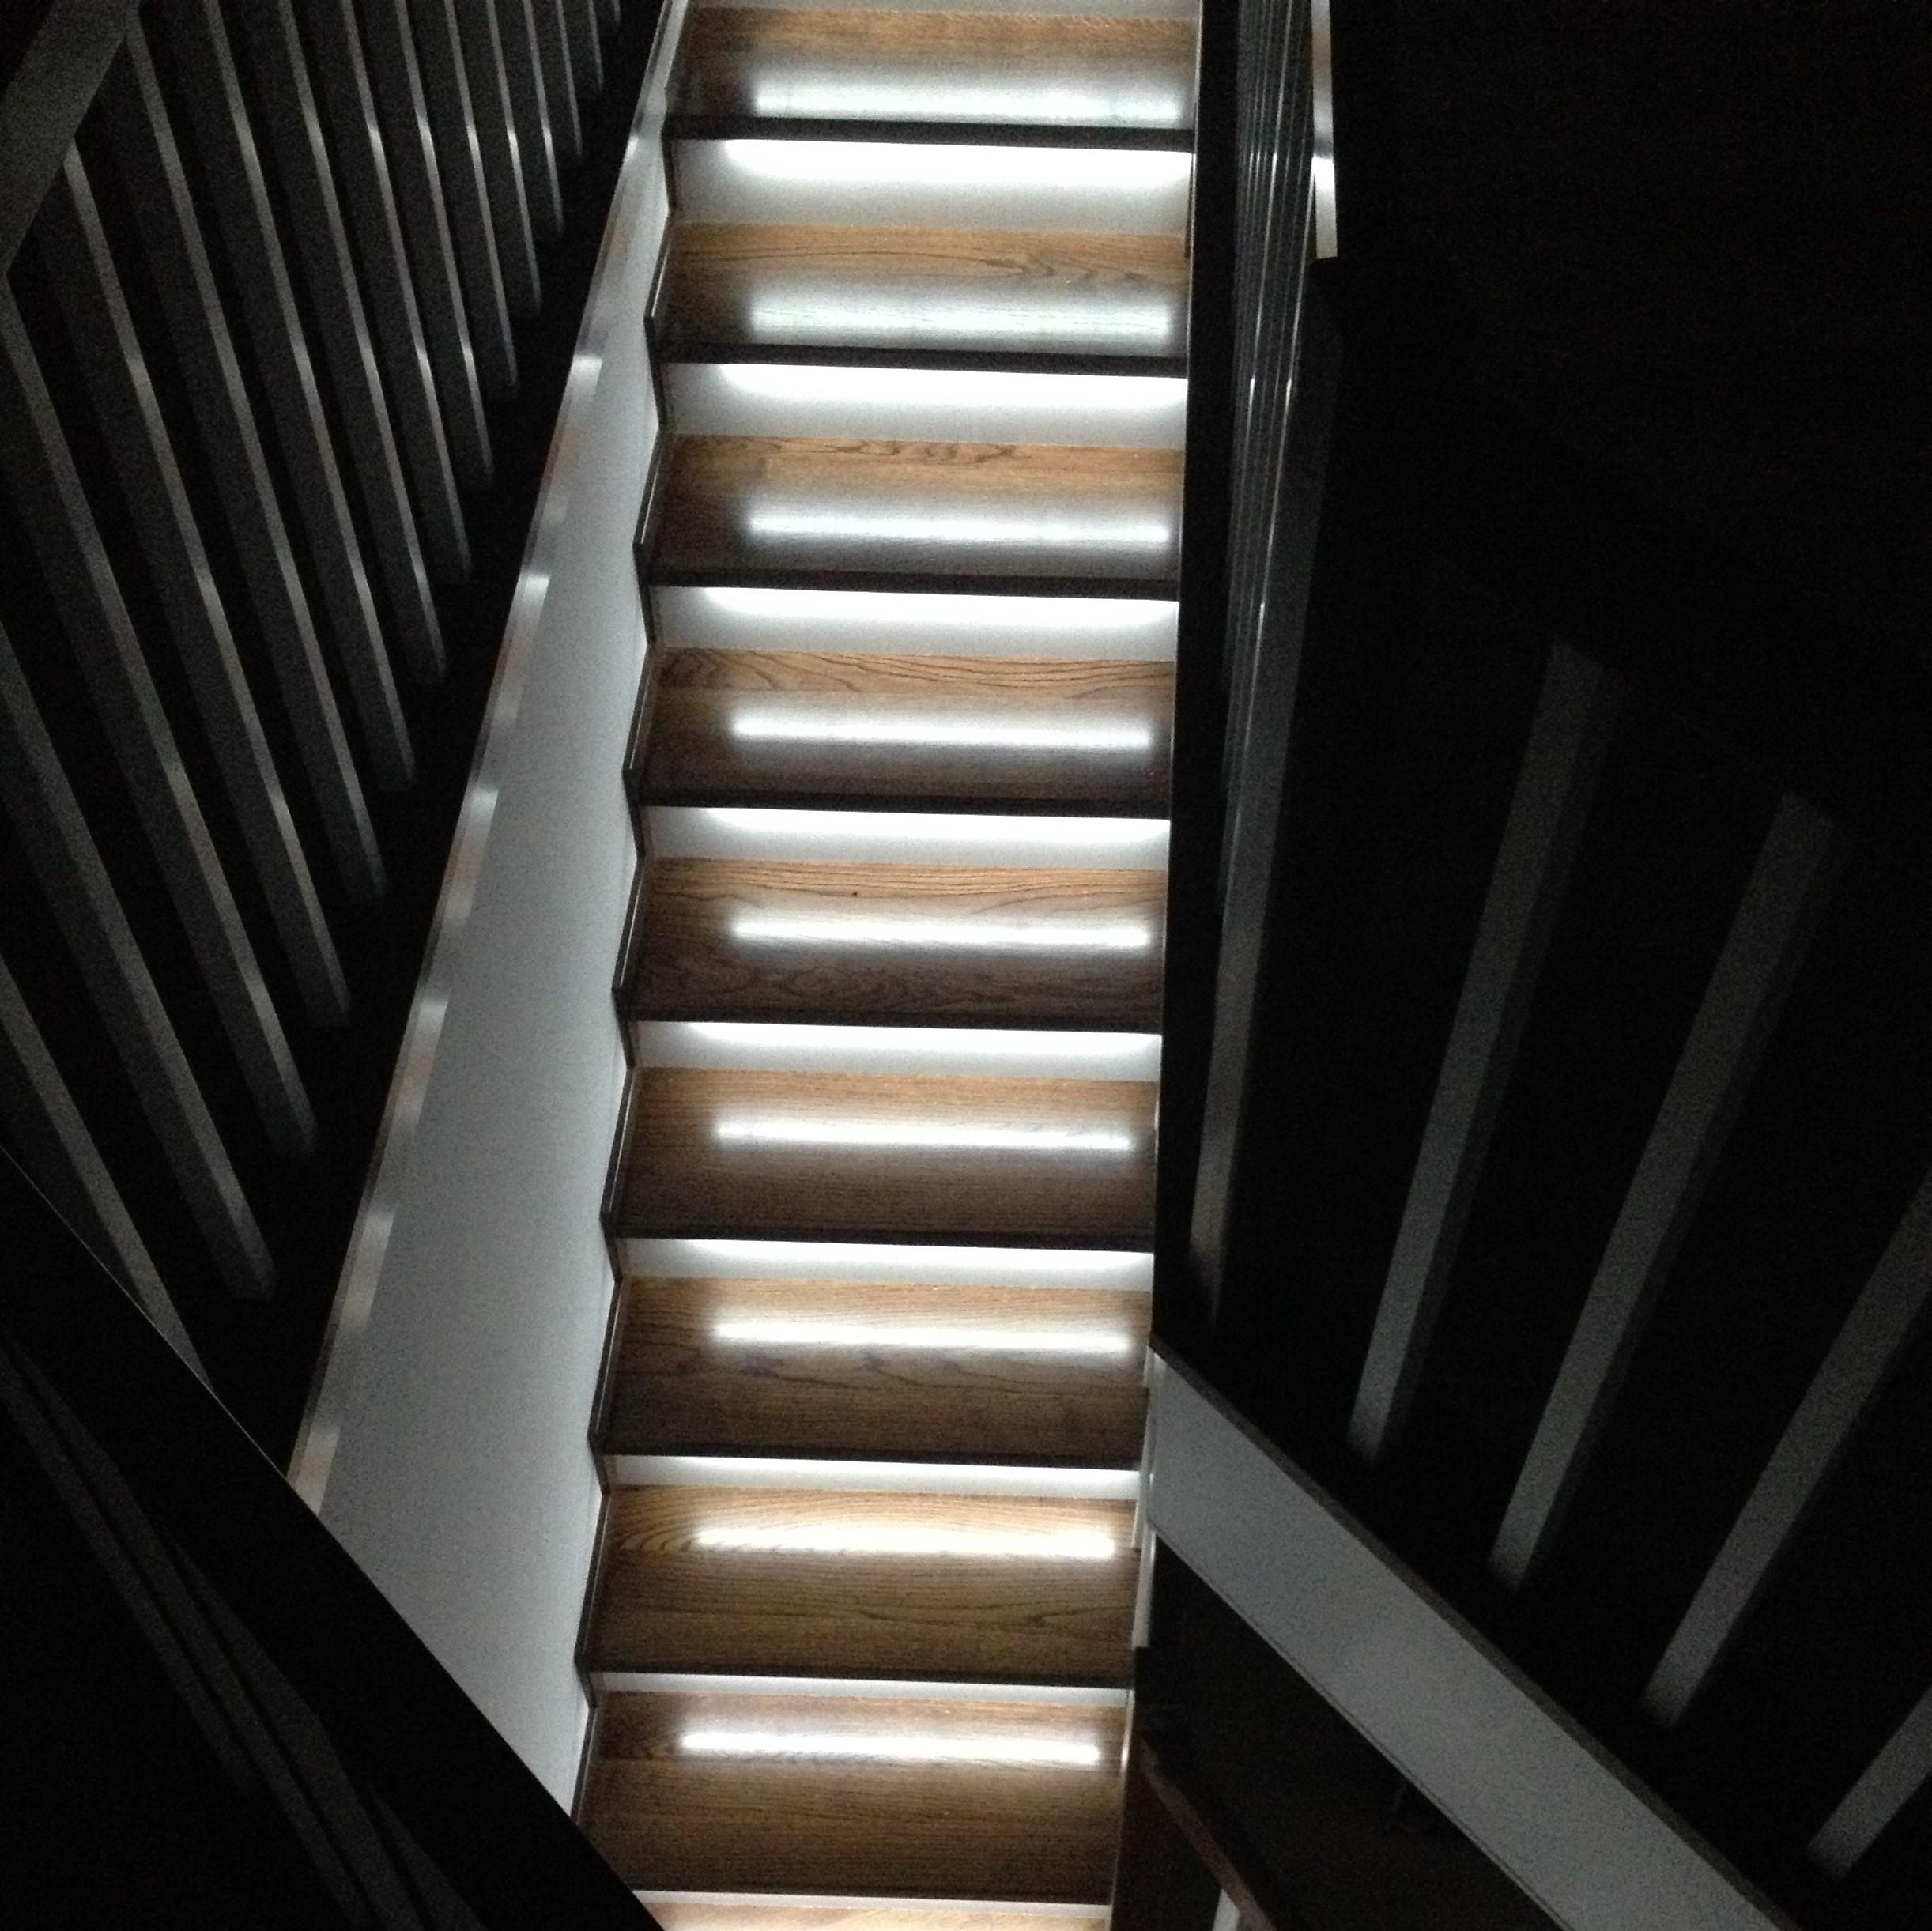 stair-lights-linear-staircase-down.JPG